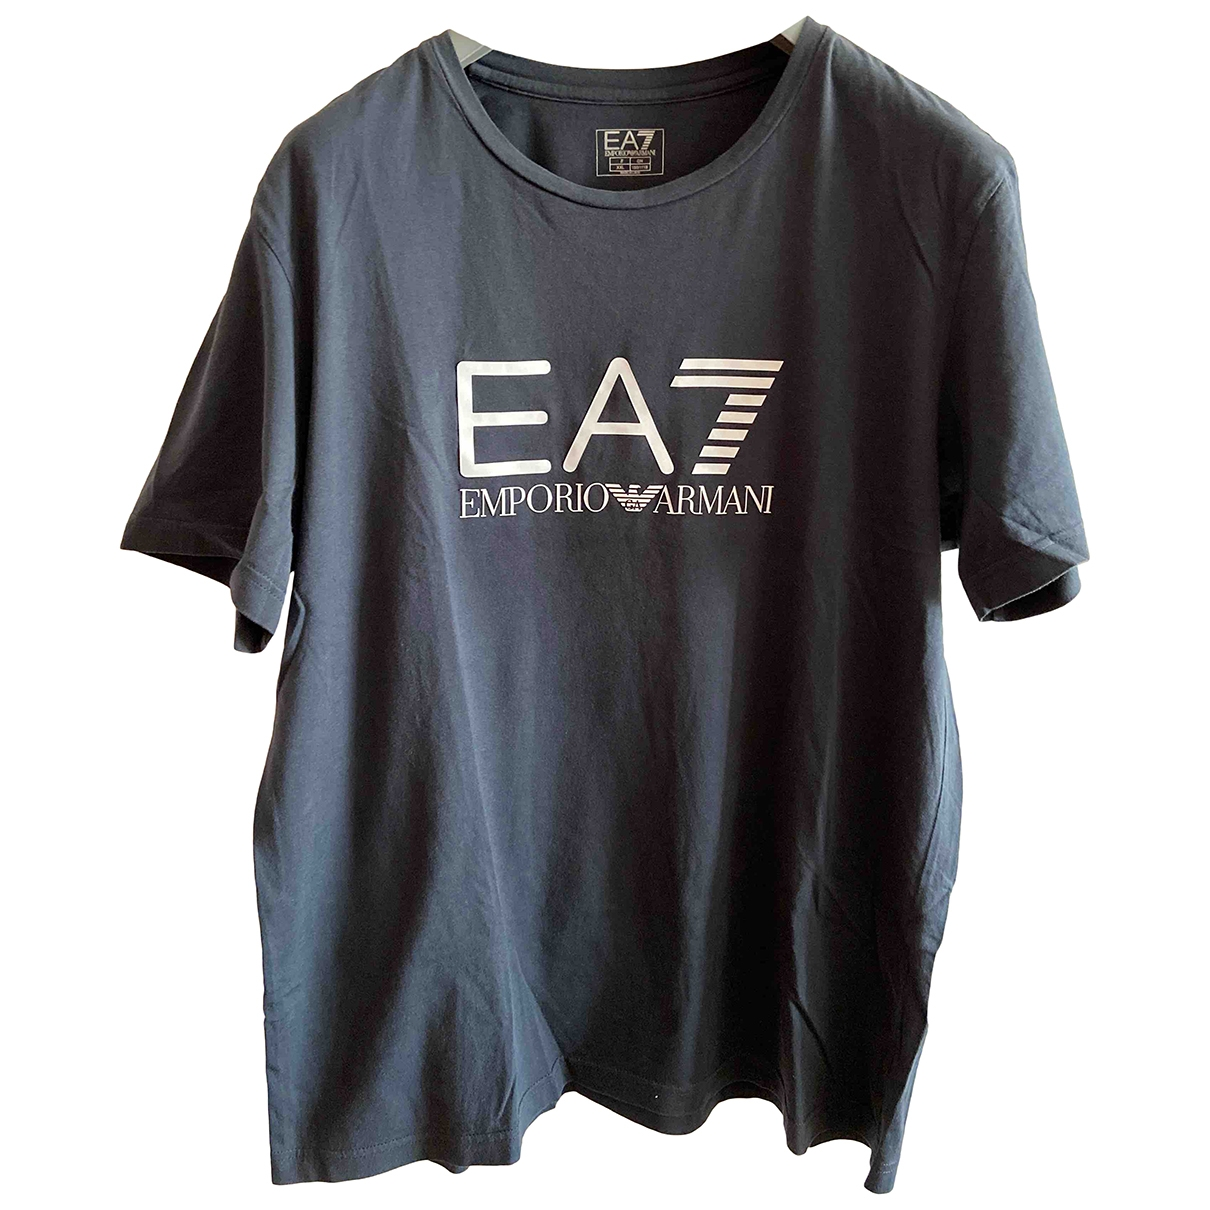 Emporio Armani - Tee shirts   pour homme en coton - marine